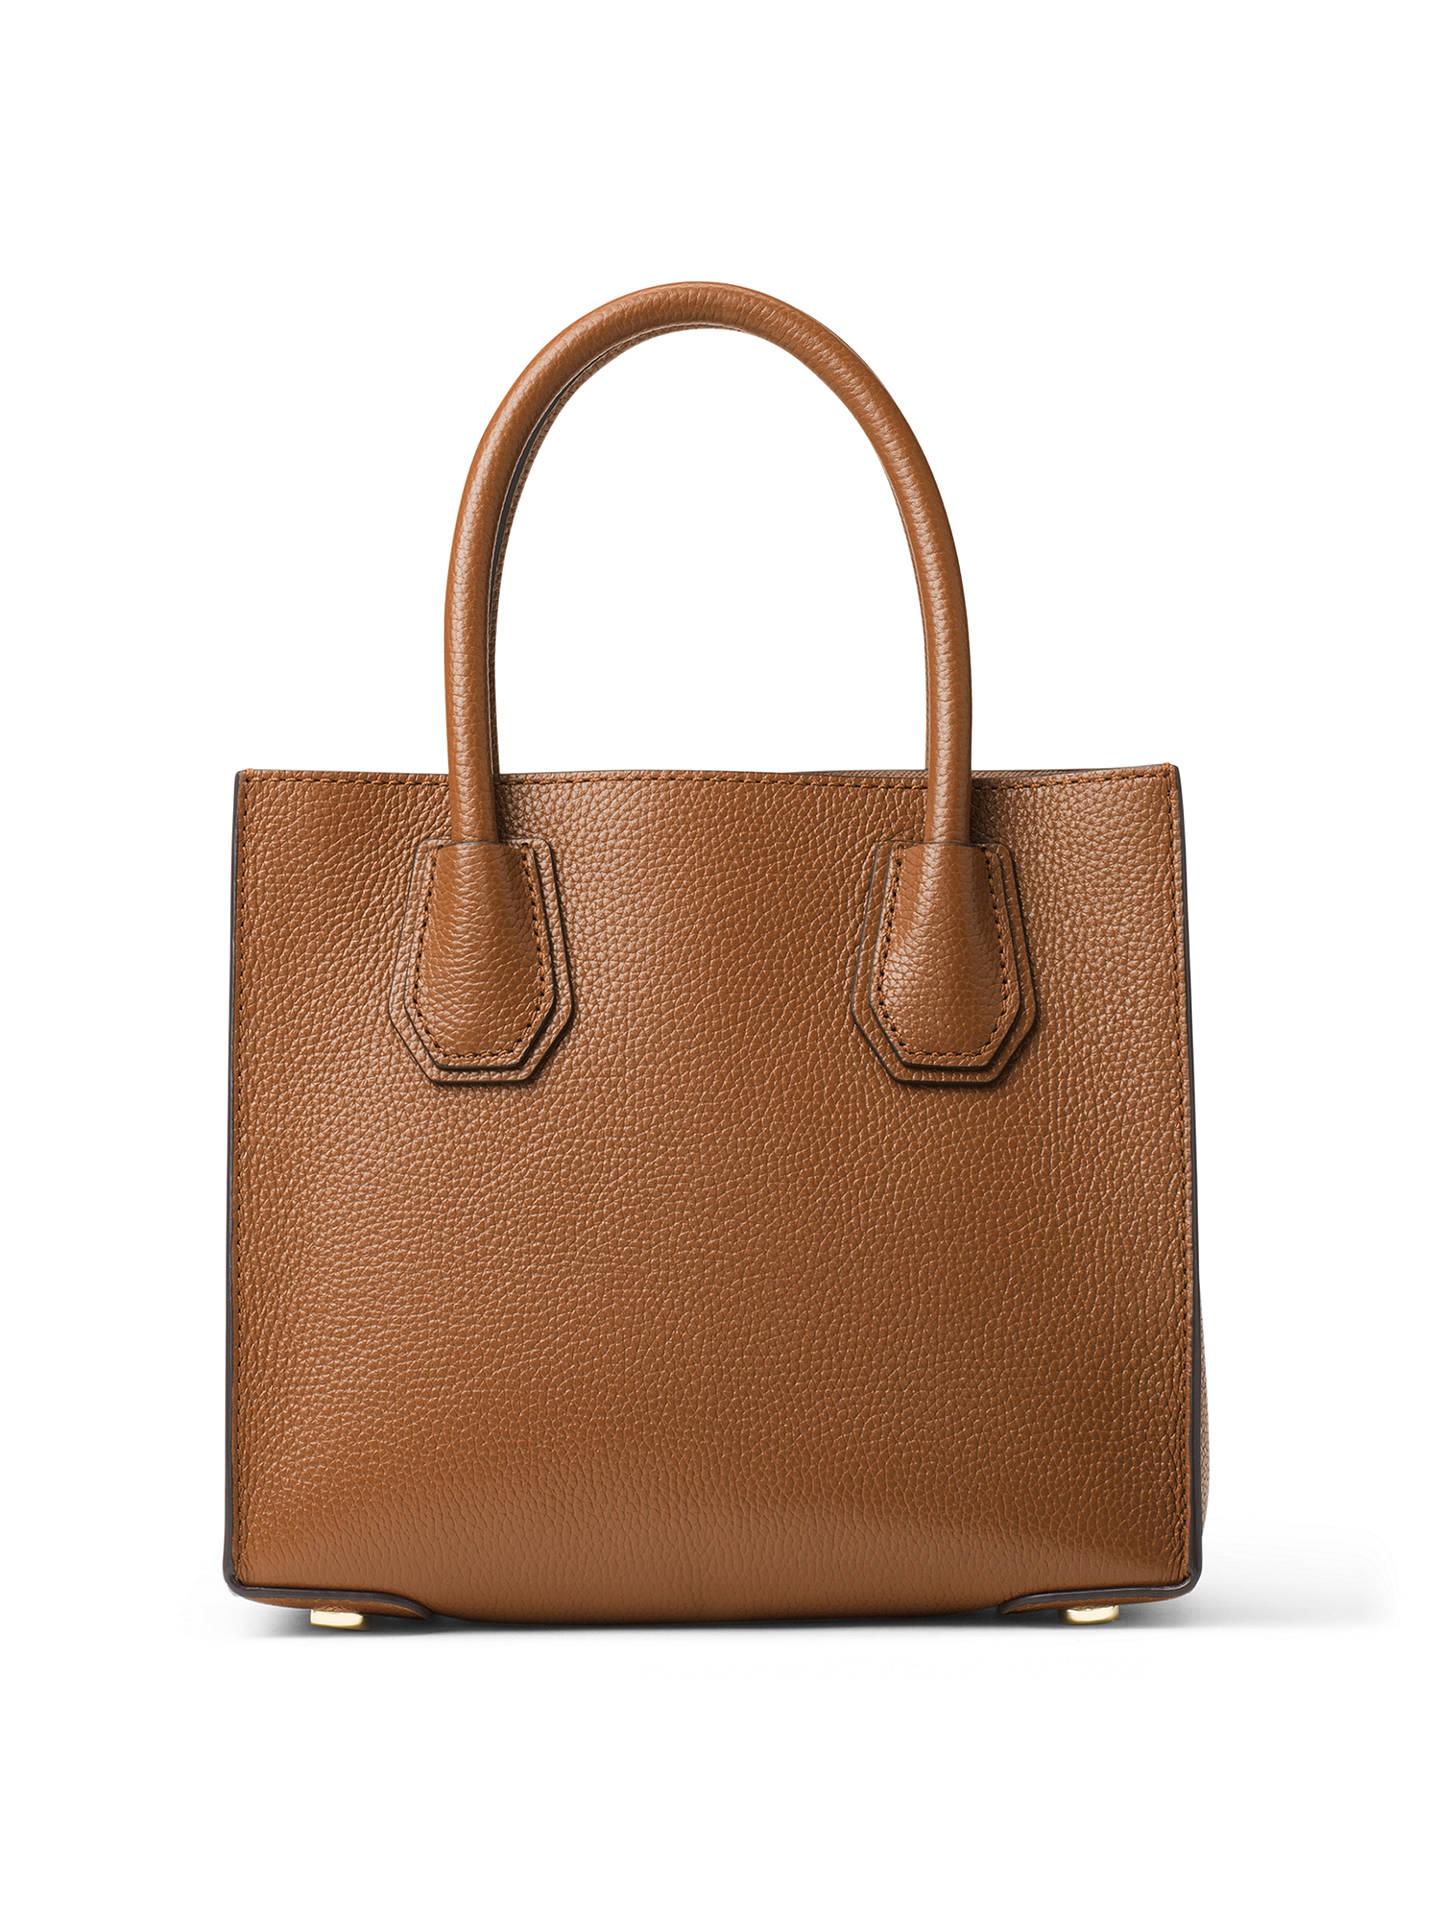 ddbd9636e964 ... Buy MICHAEL Michael Kors Mercer Leather Cross Body Bag, Luggage Online  at johnlewis.com ...